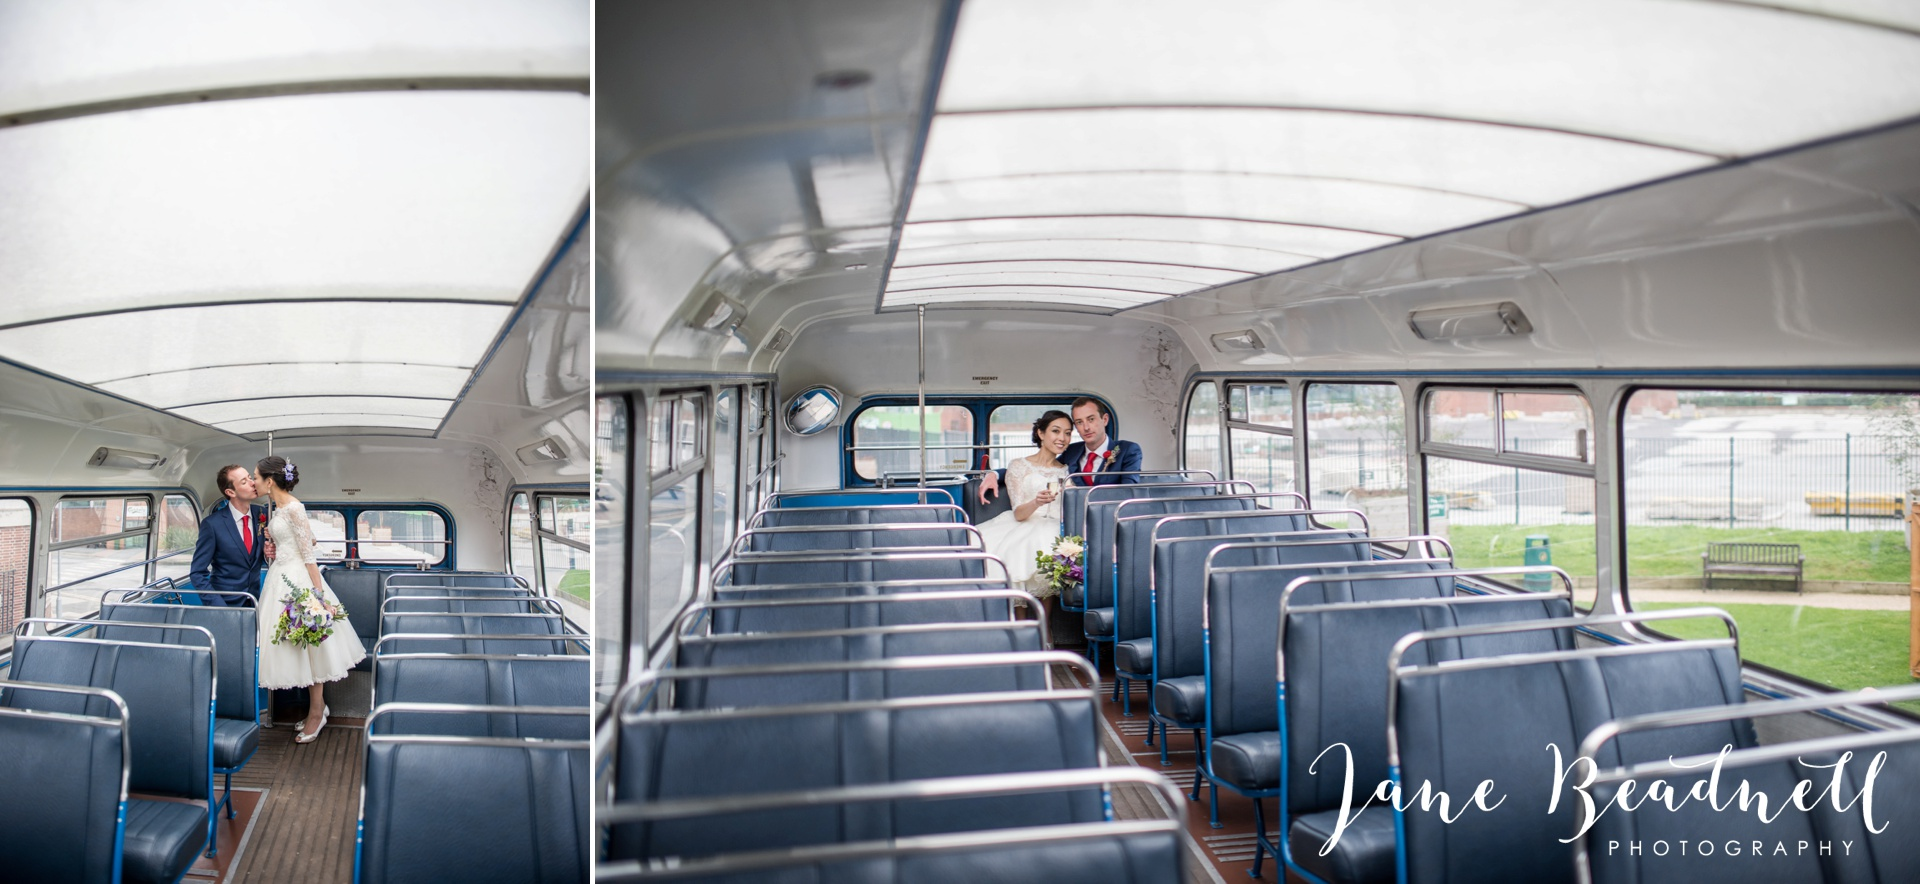 The Tetley Leeds Wedding Photography by Jane Beadnell_0066